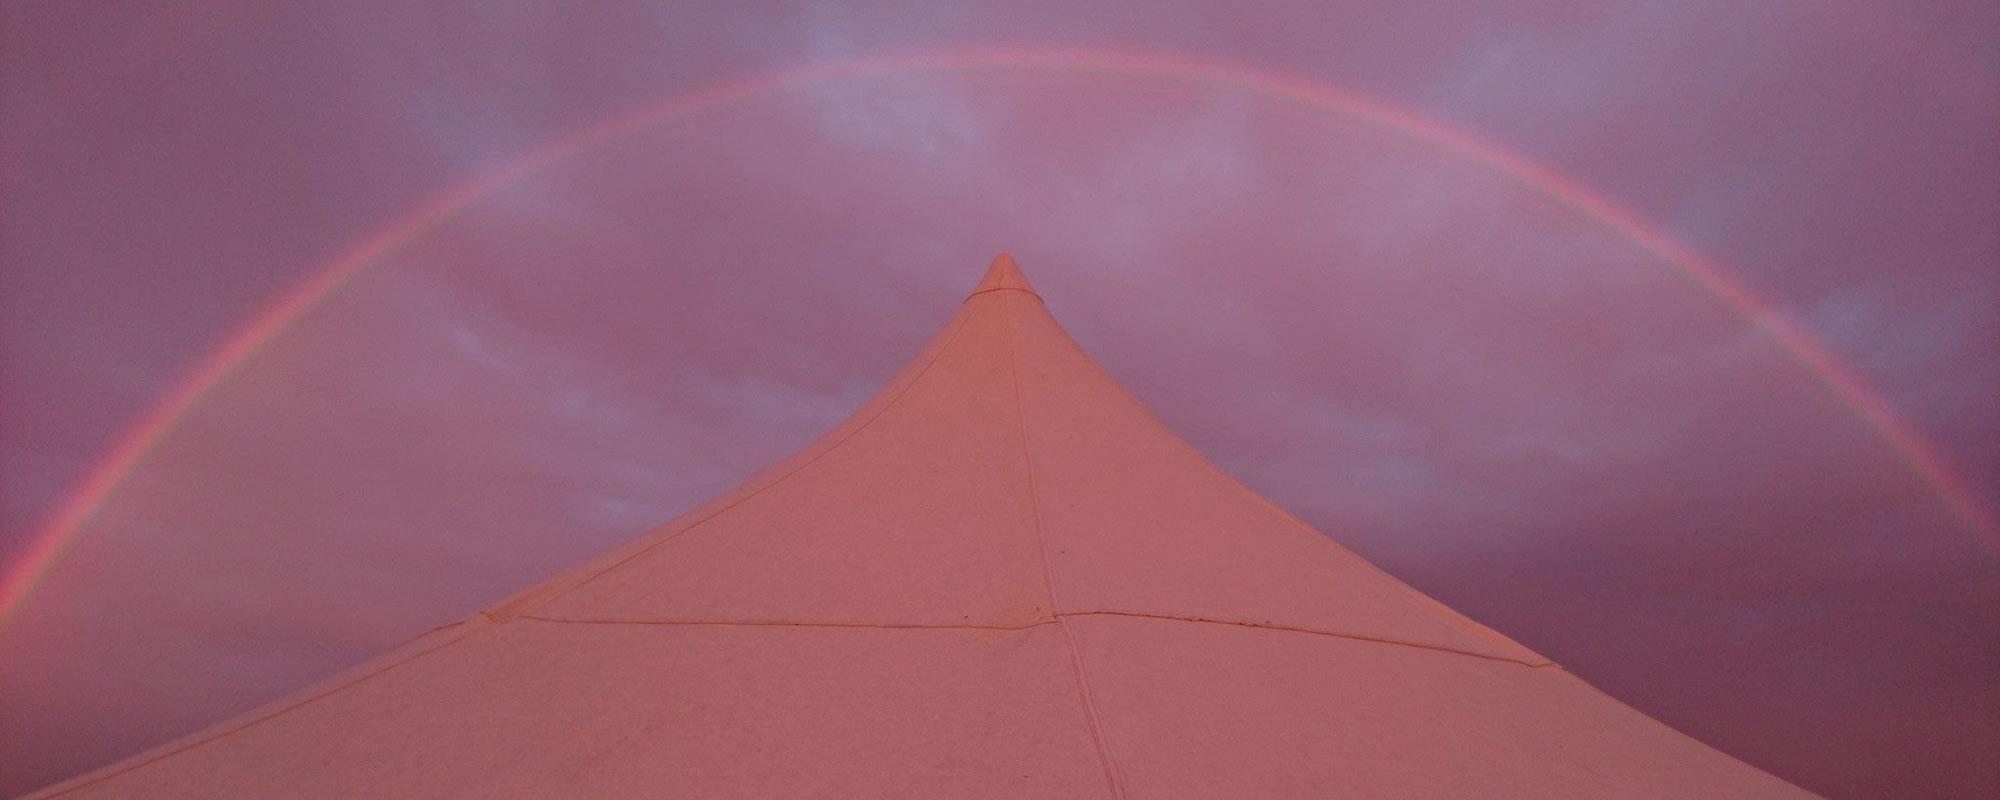 banner-top-of-tent